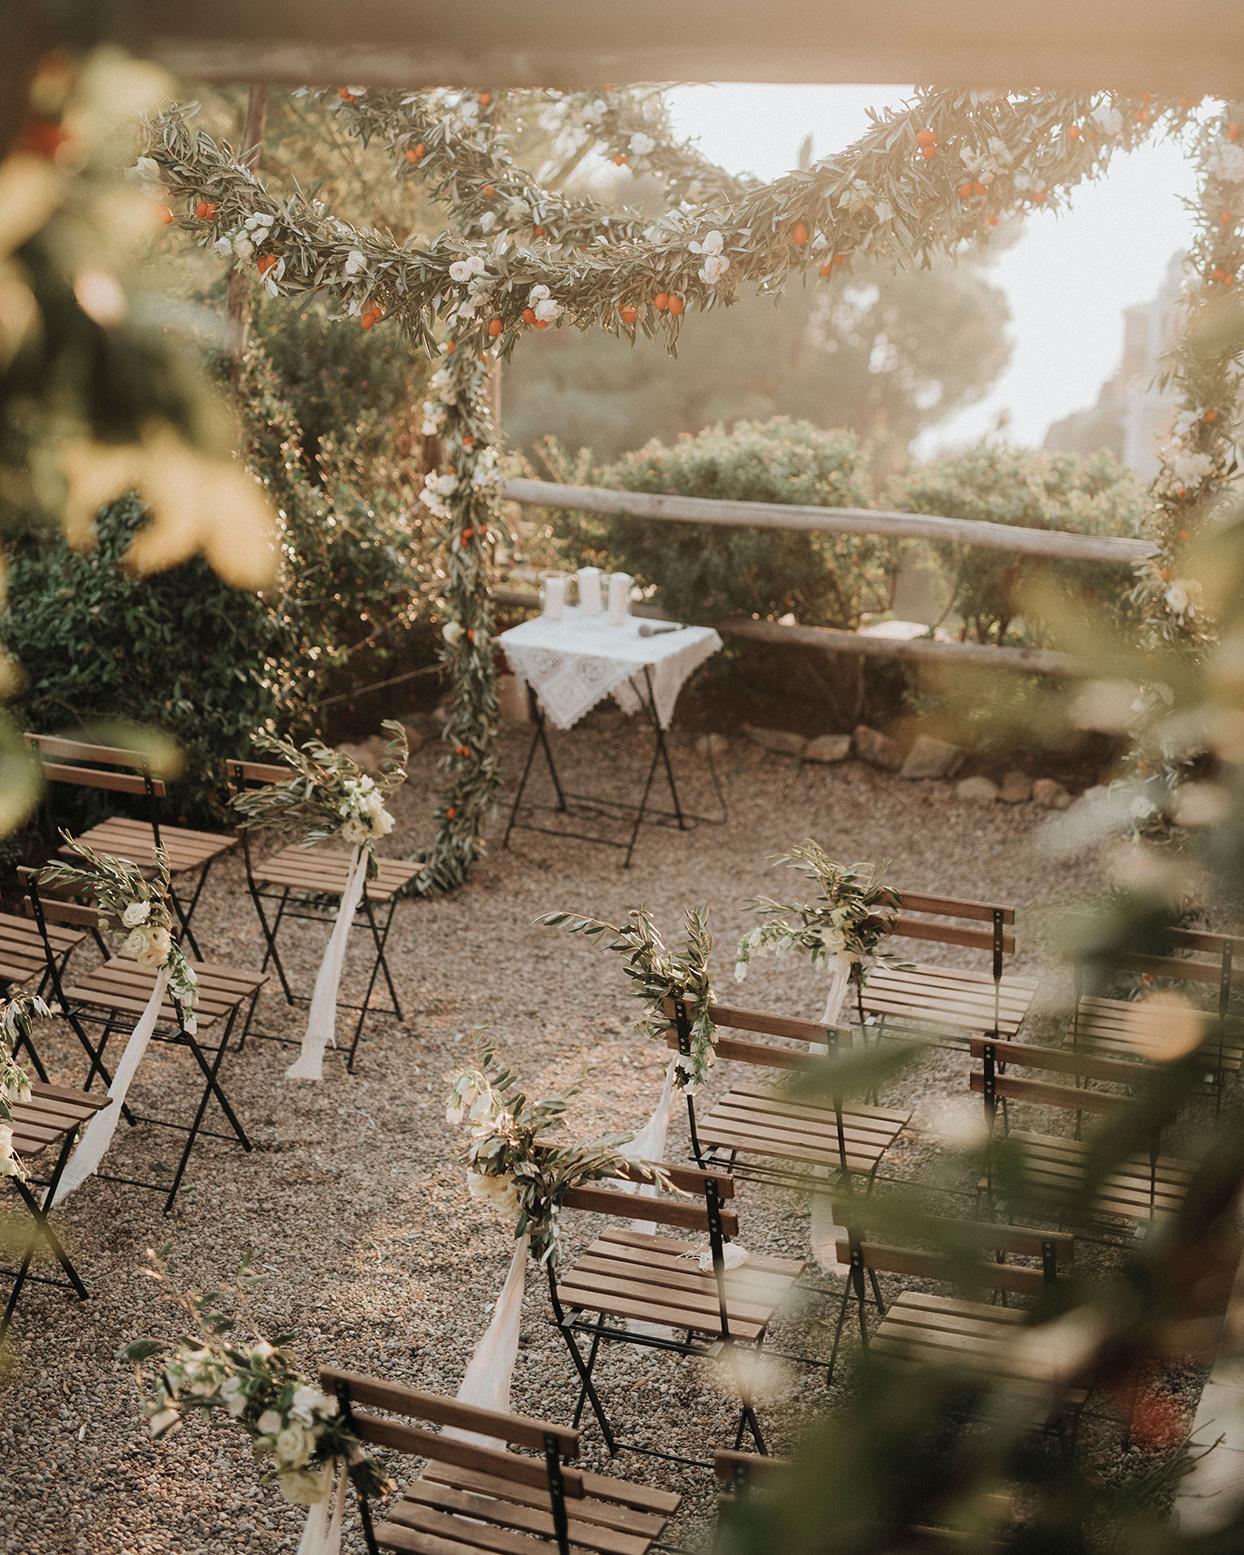 jaclyn antonio wedding ceremony space chairs